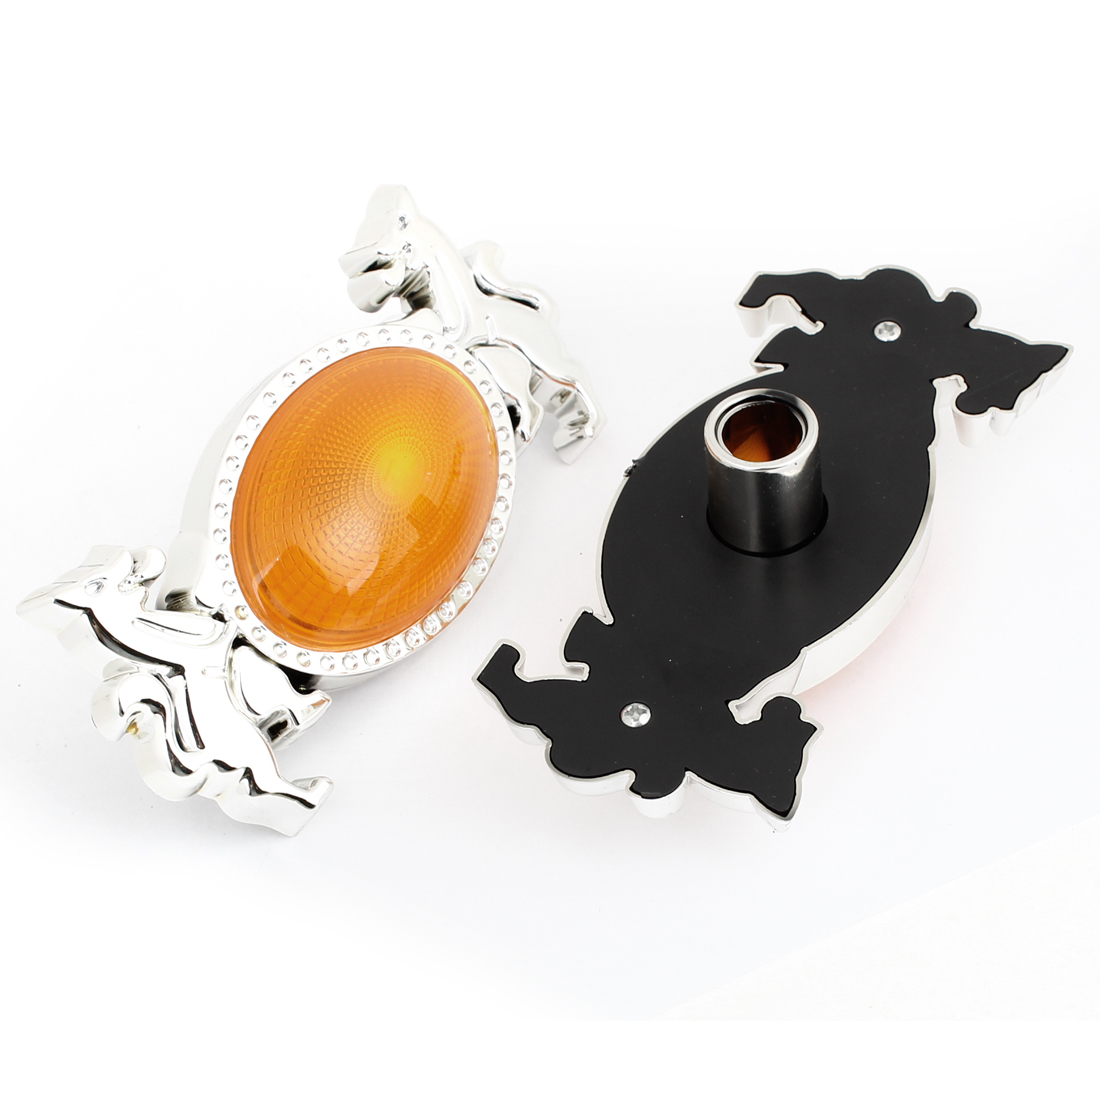 Orange Silver Tone Plastic Light Lamp Cover Guard 2pcs for Car